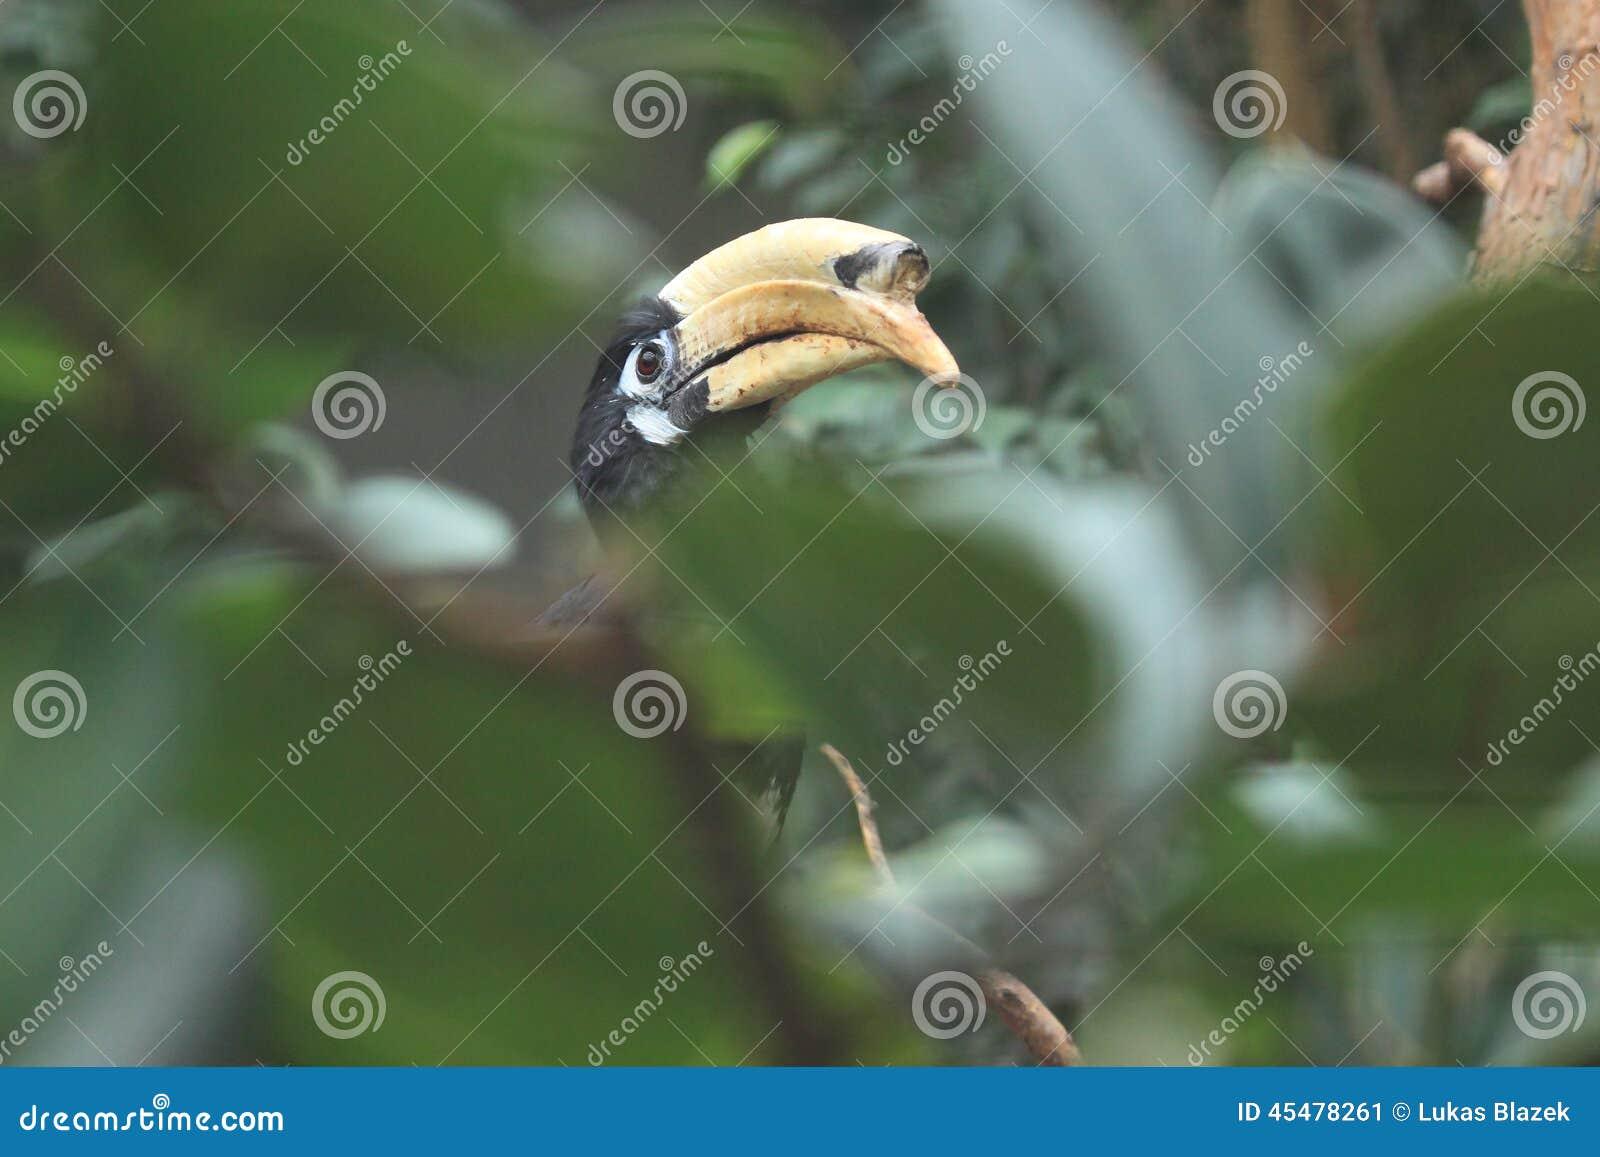 犀鸟东方染色